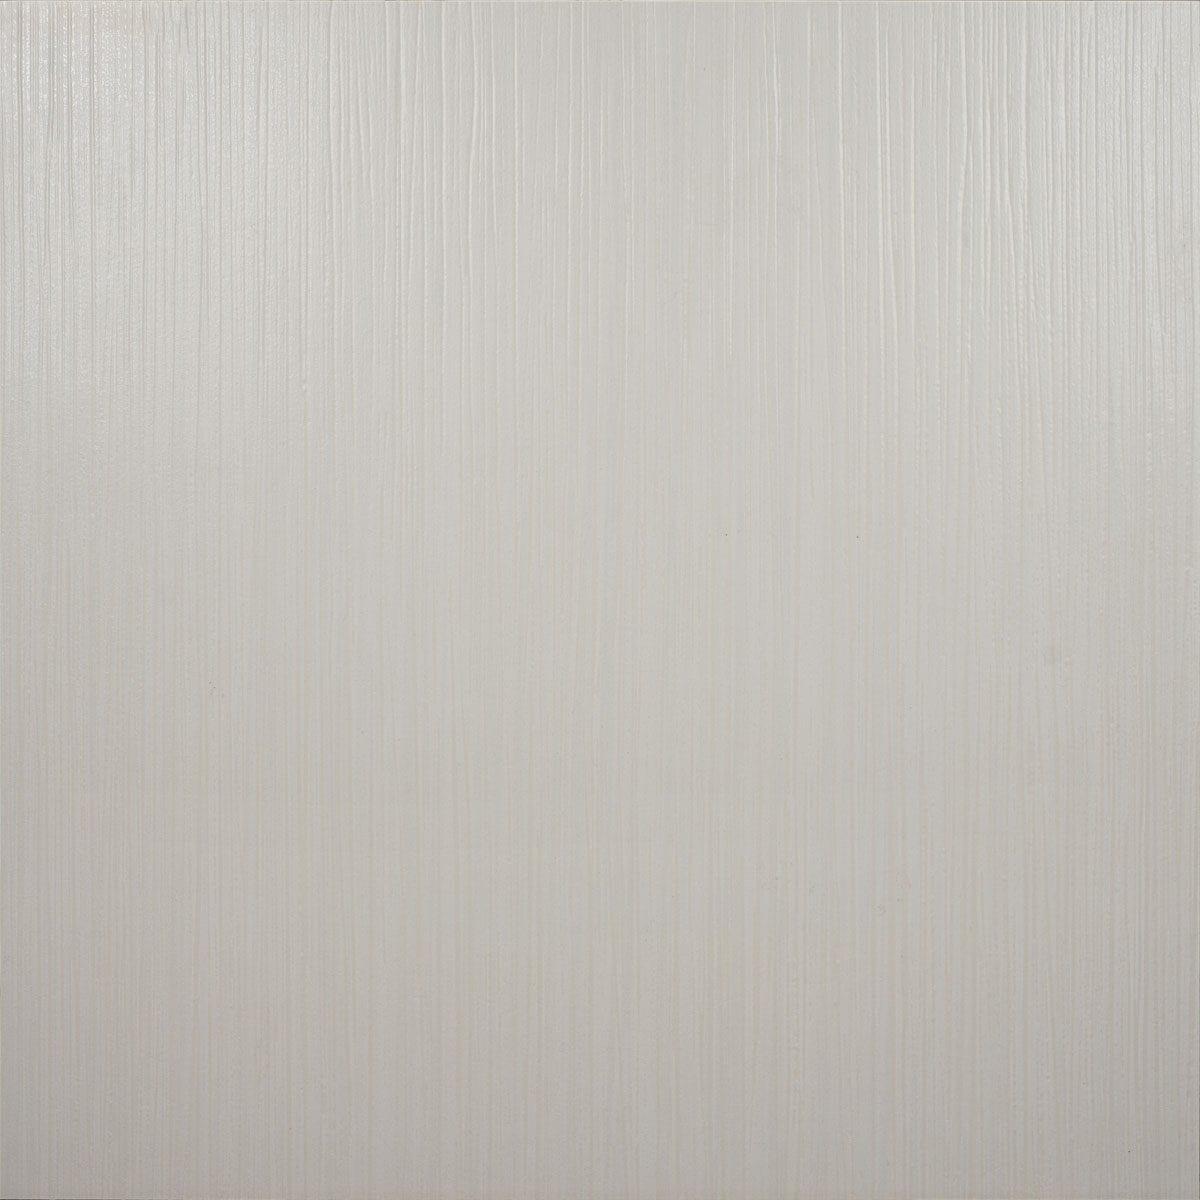 CREEK WHITE T10959 DT P1